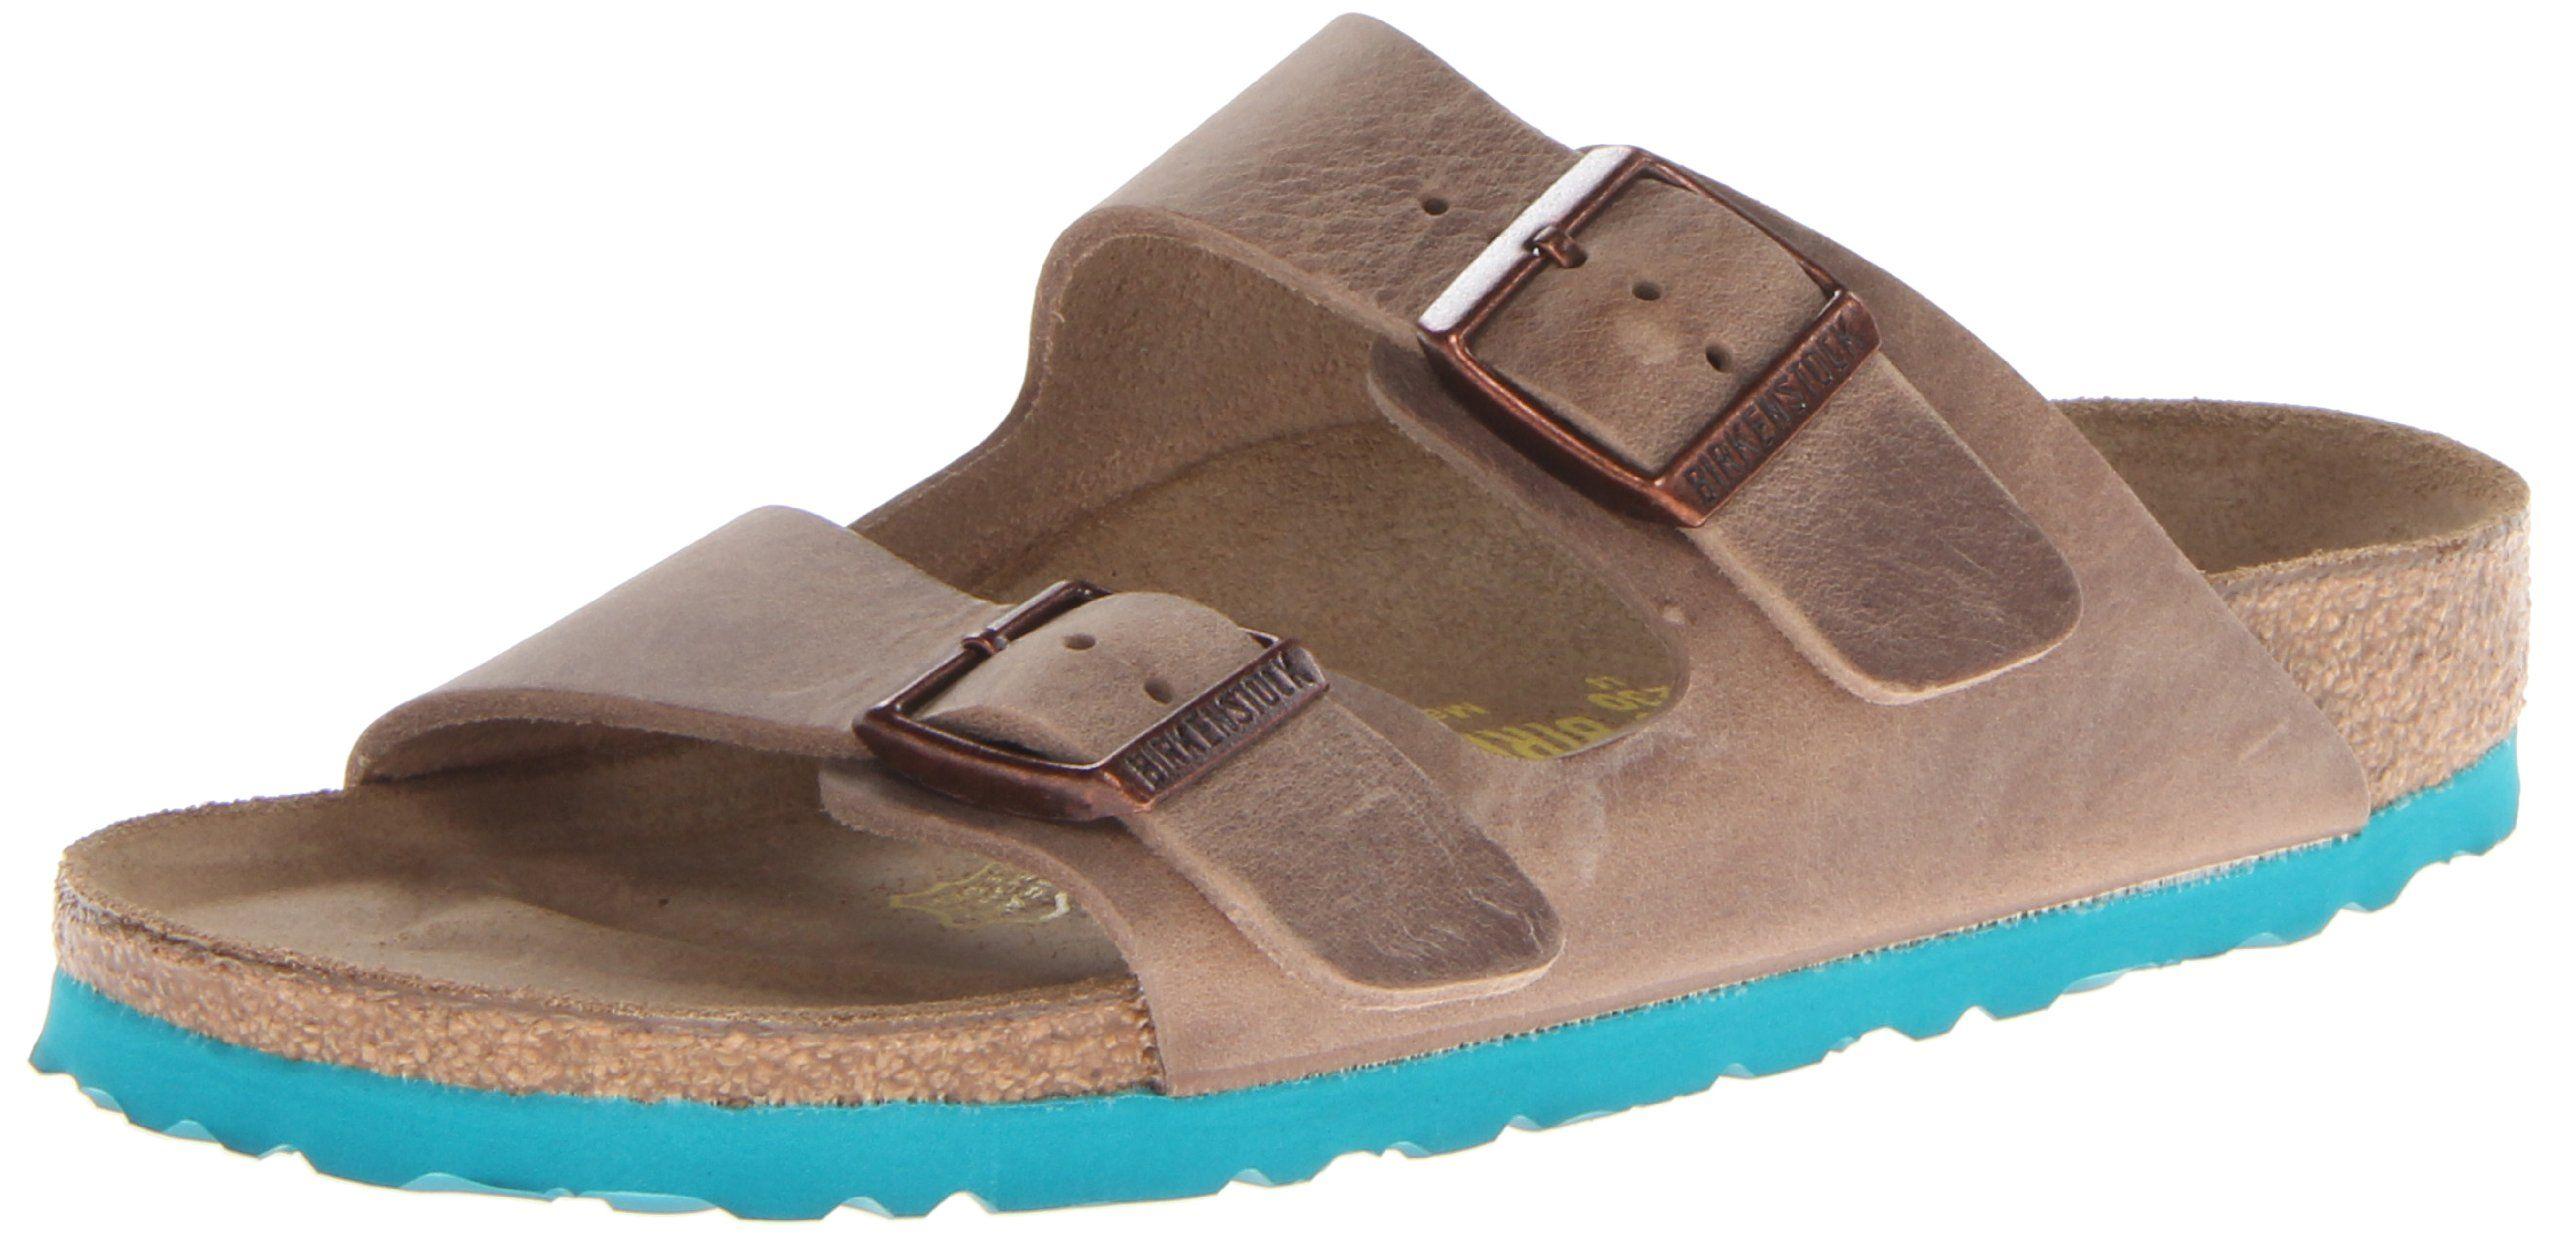 2279446a6740 Birkenstock Unisex Arizona LT Mint Sole Sandal